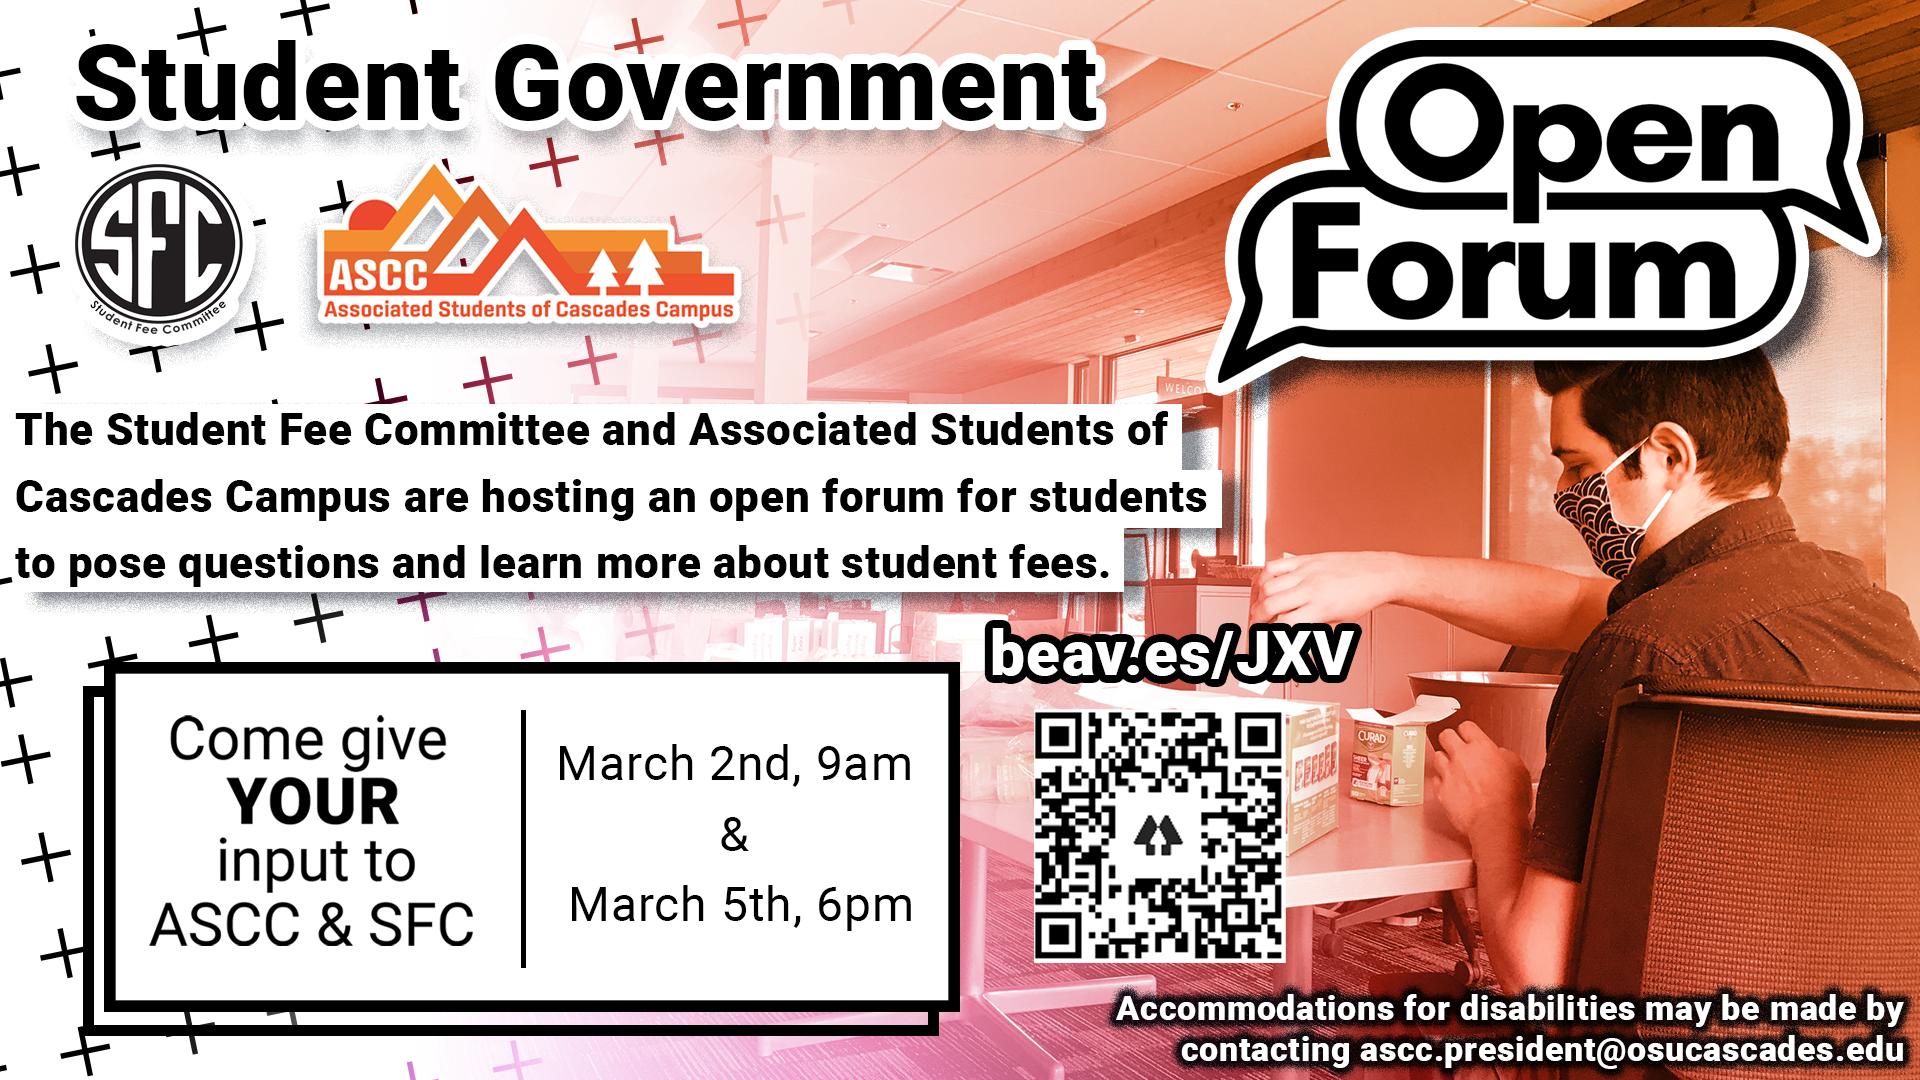 Student Government Seeking Feedback